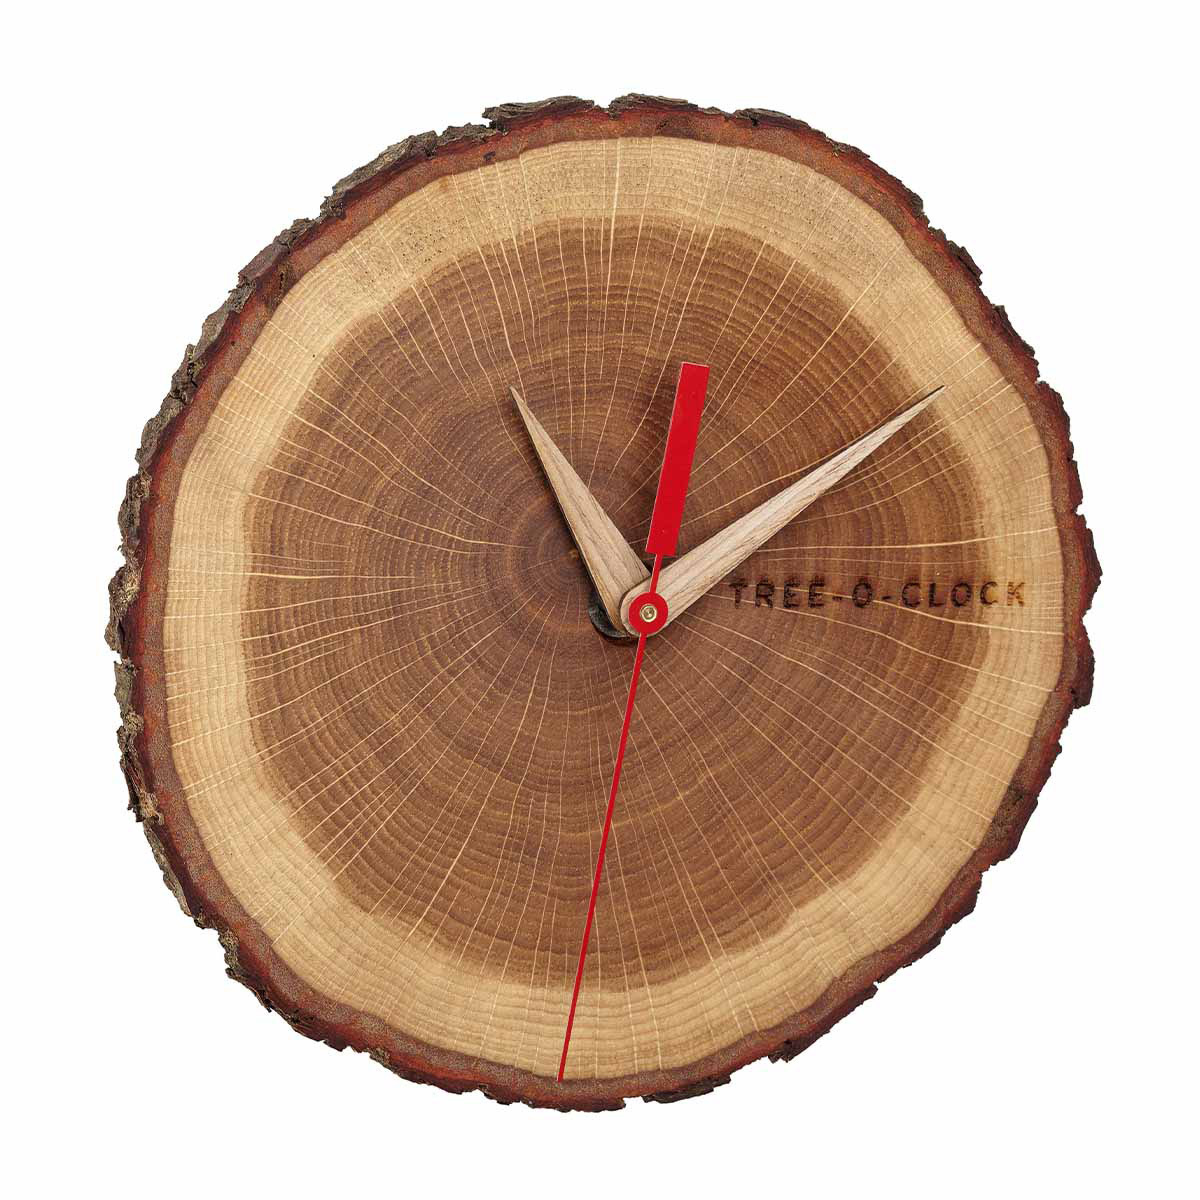 "Настенные часы TFA ""Tree-o-Clock"" (60304608)"